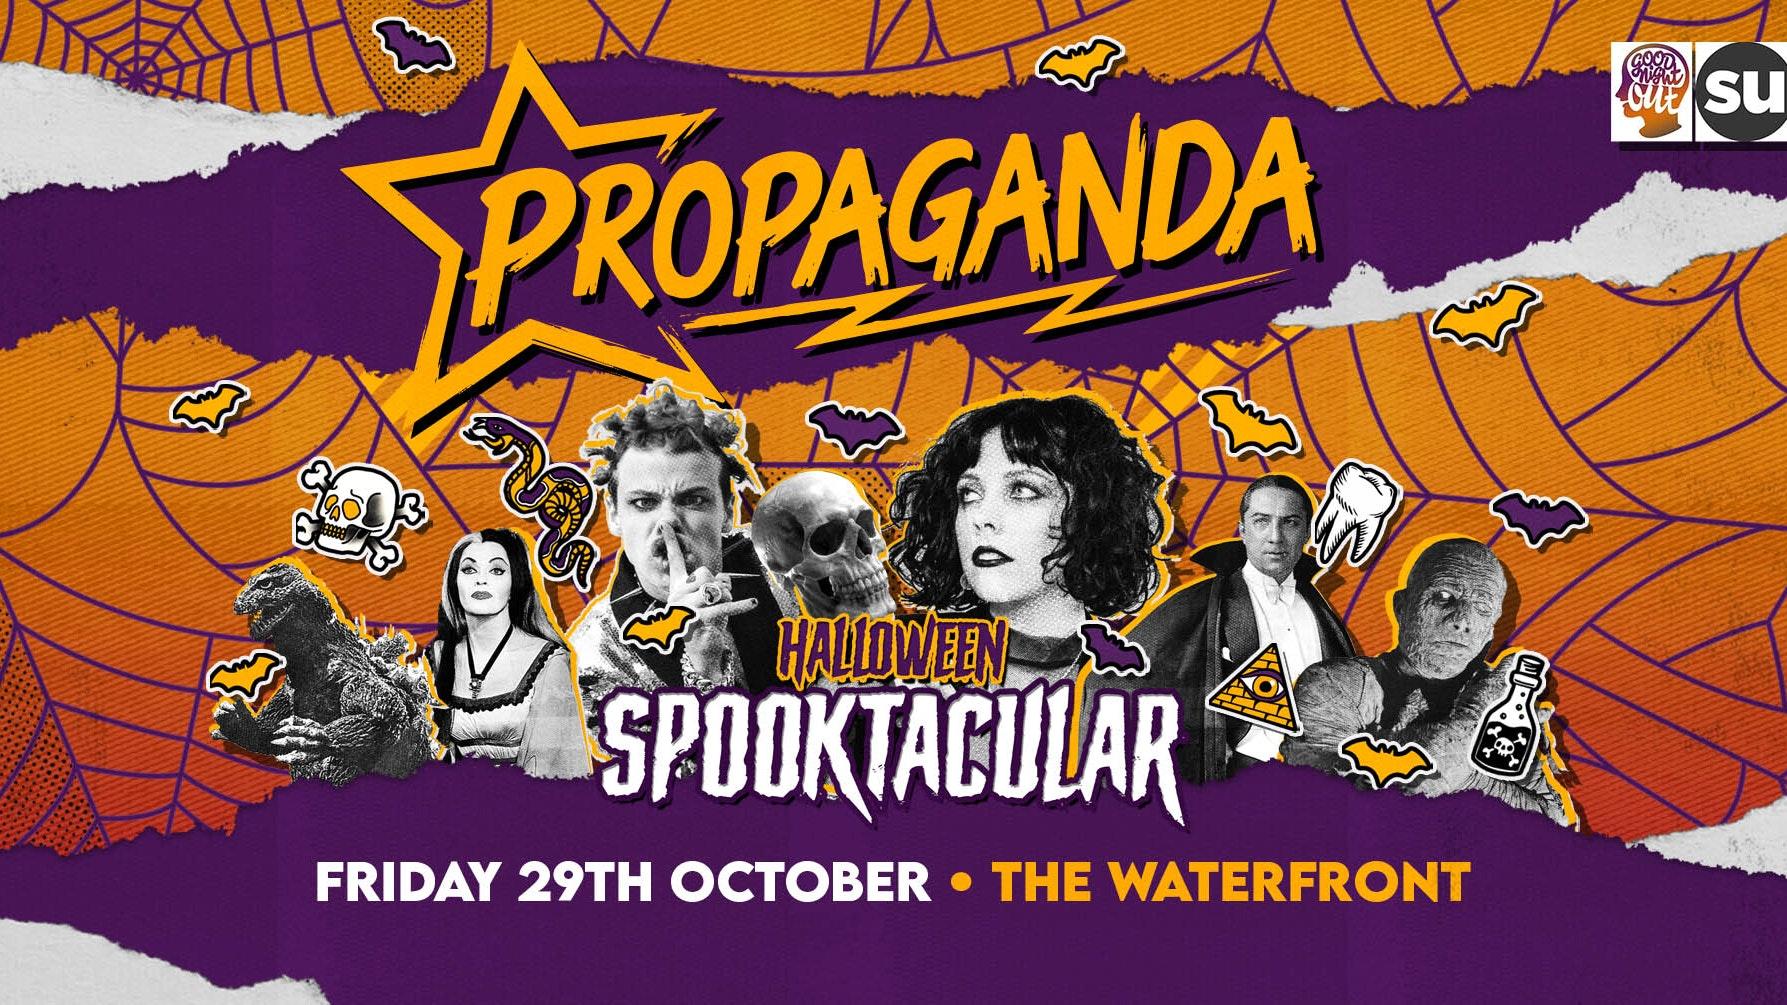 Propaganda Norwich – Halloween Spooktacular!